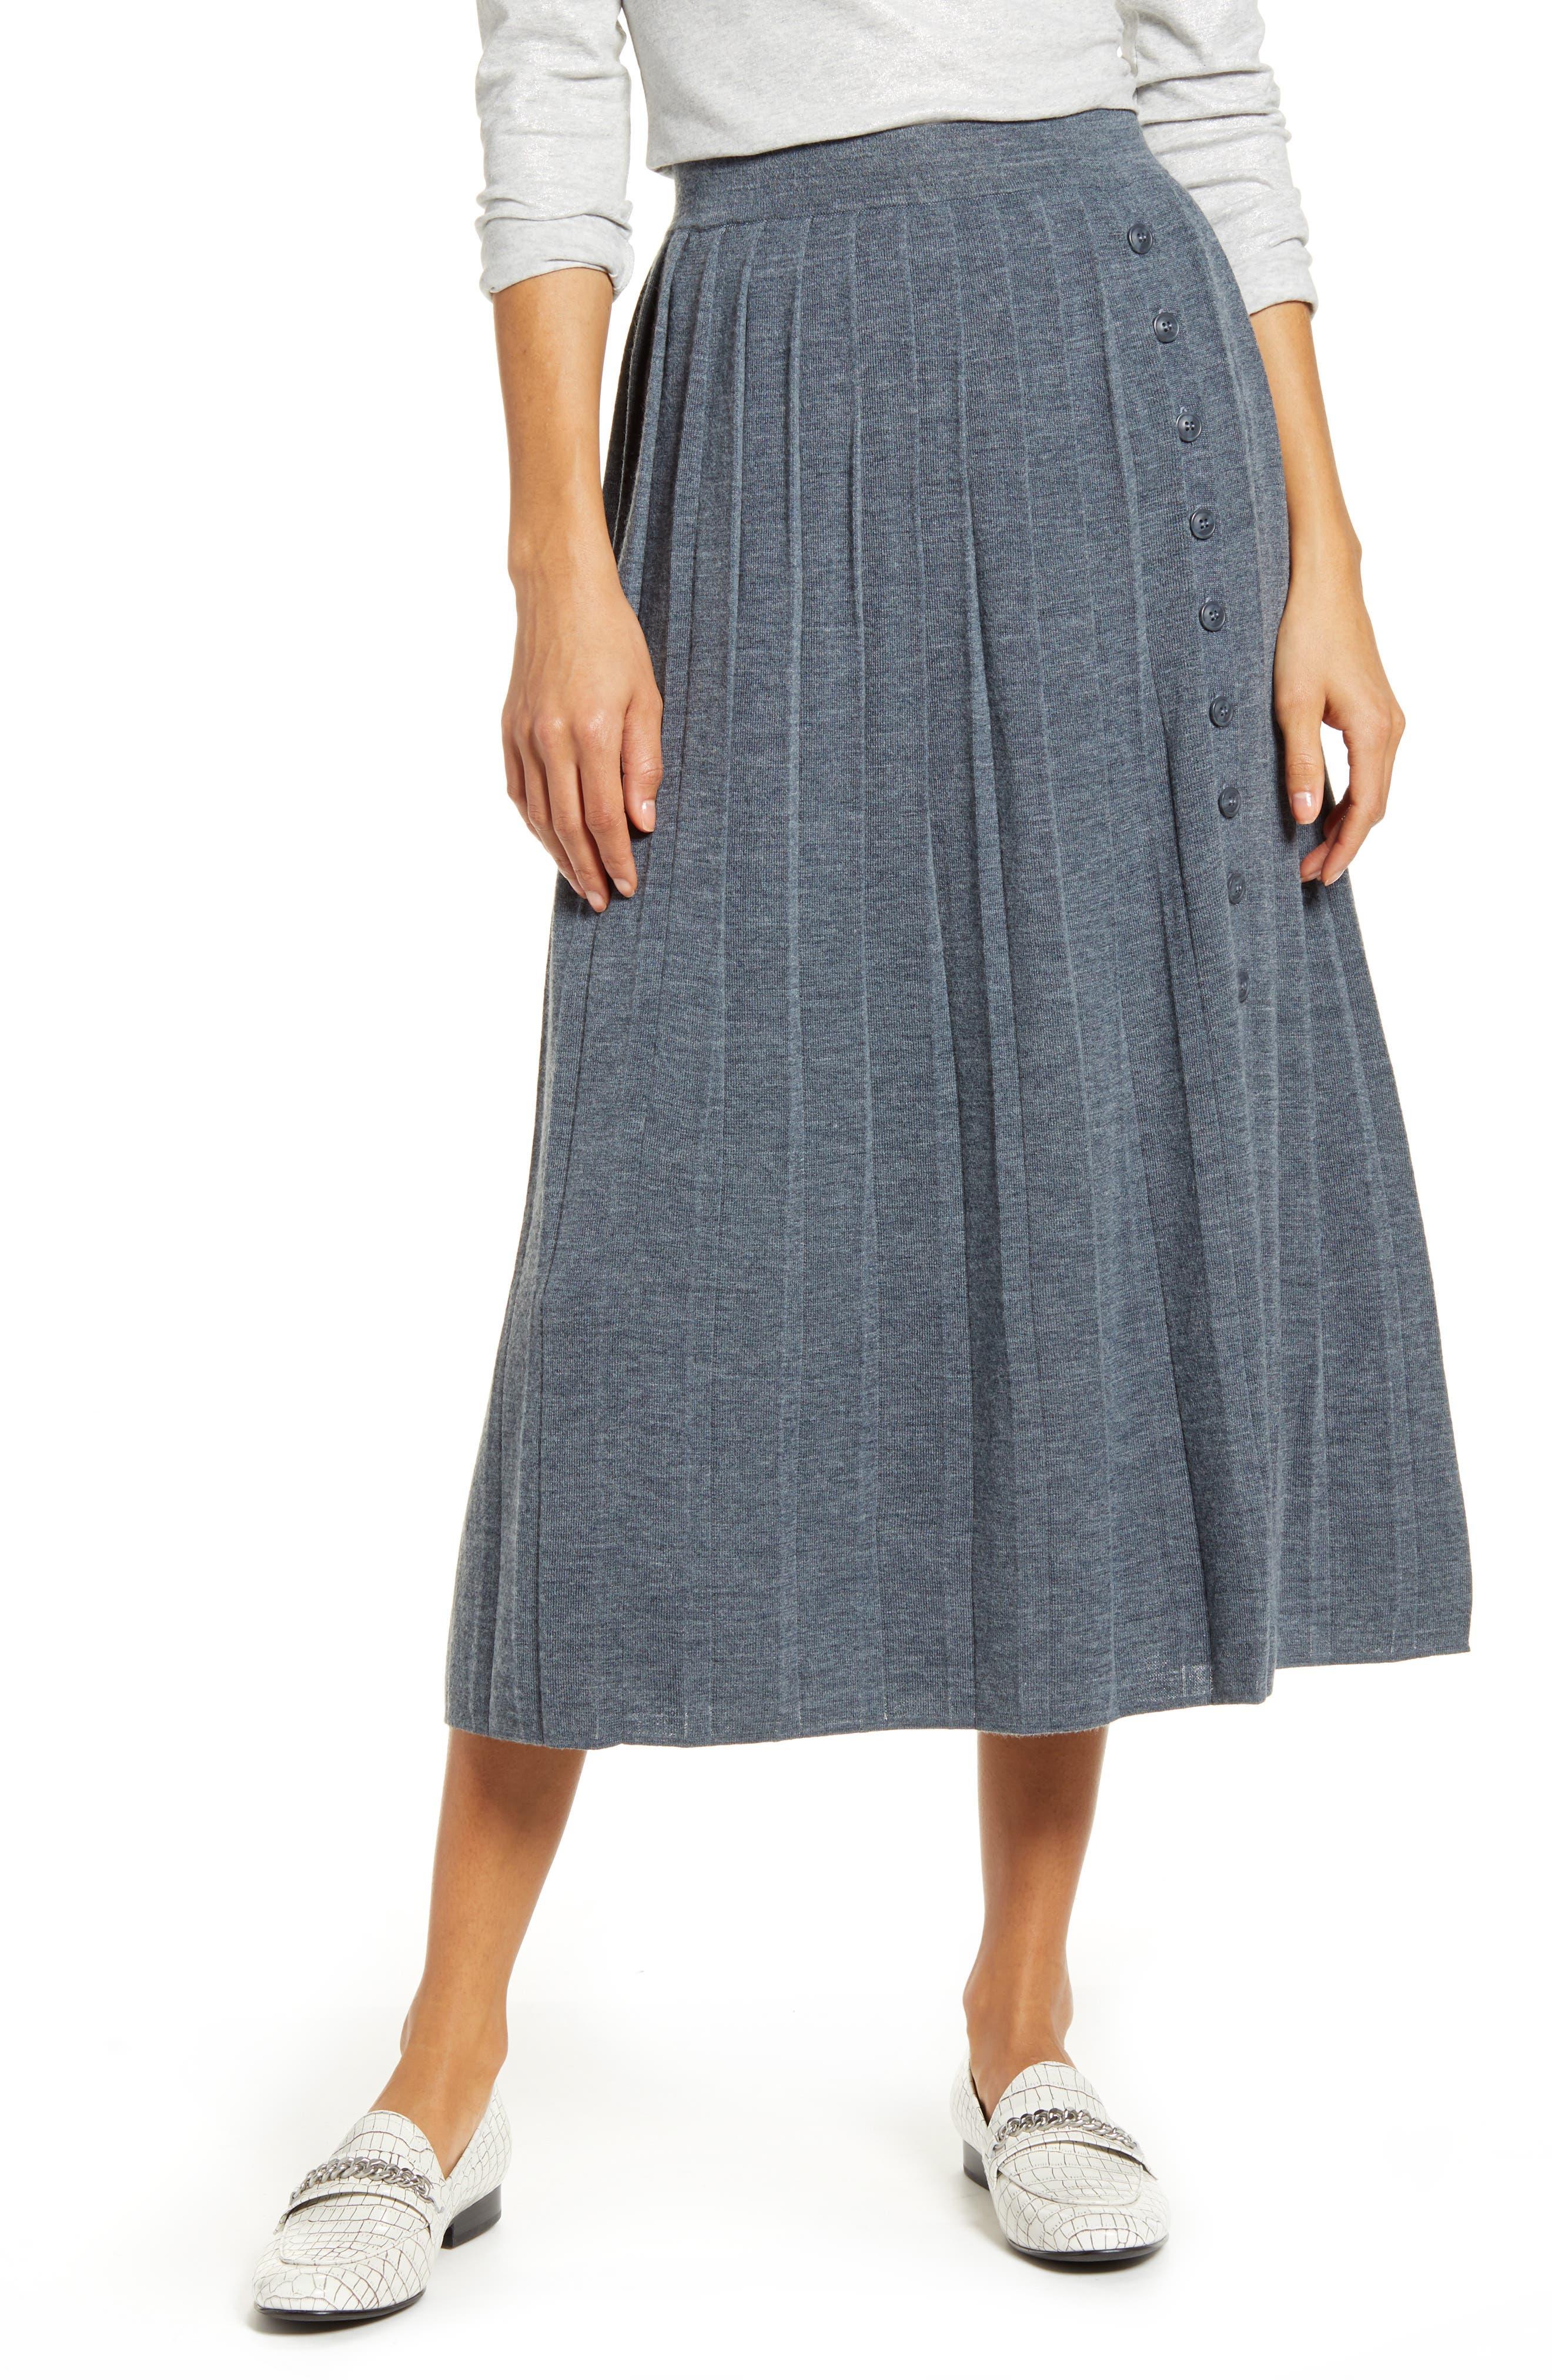 Victorian Skirts   Bustle, Walking, Edwardian Skirts Womens 1901 Pleated Sweater Skirt Size Large - Grey $89.00 AT vintagedancer.com